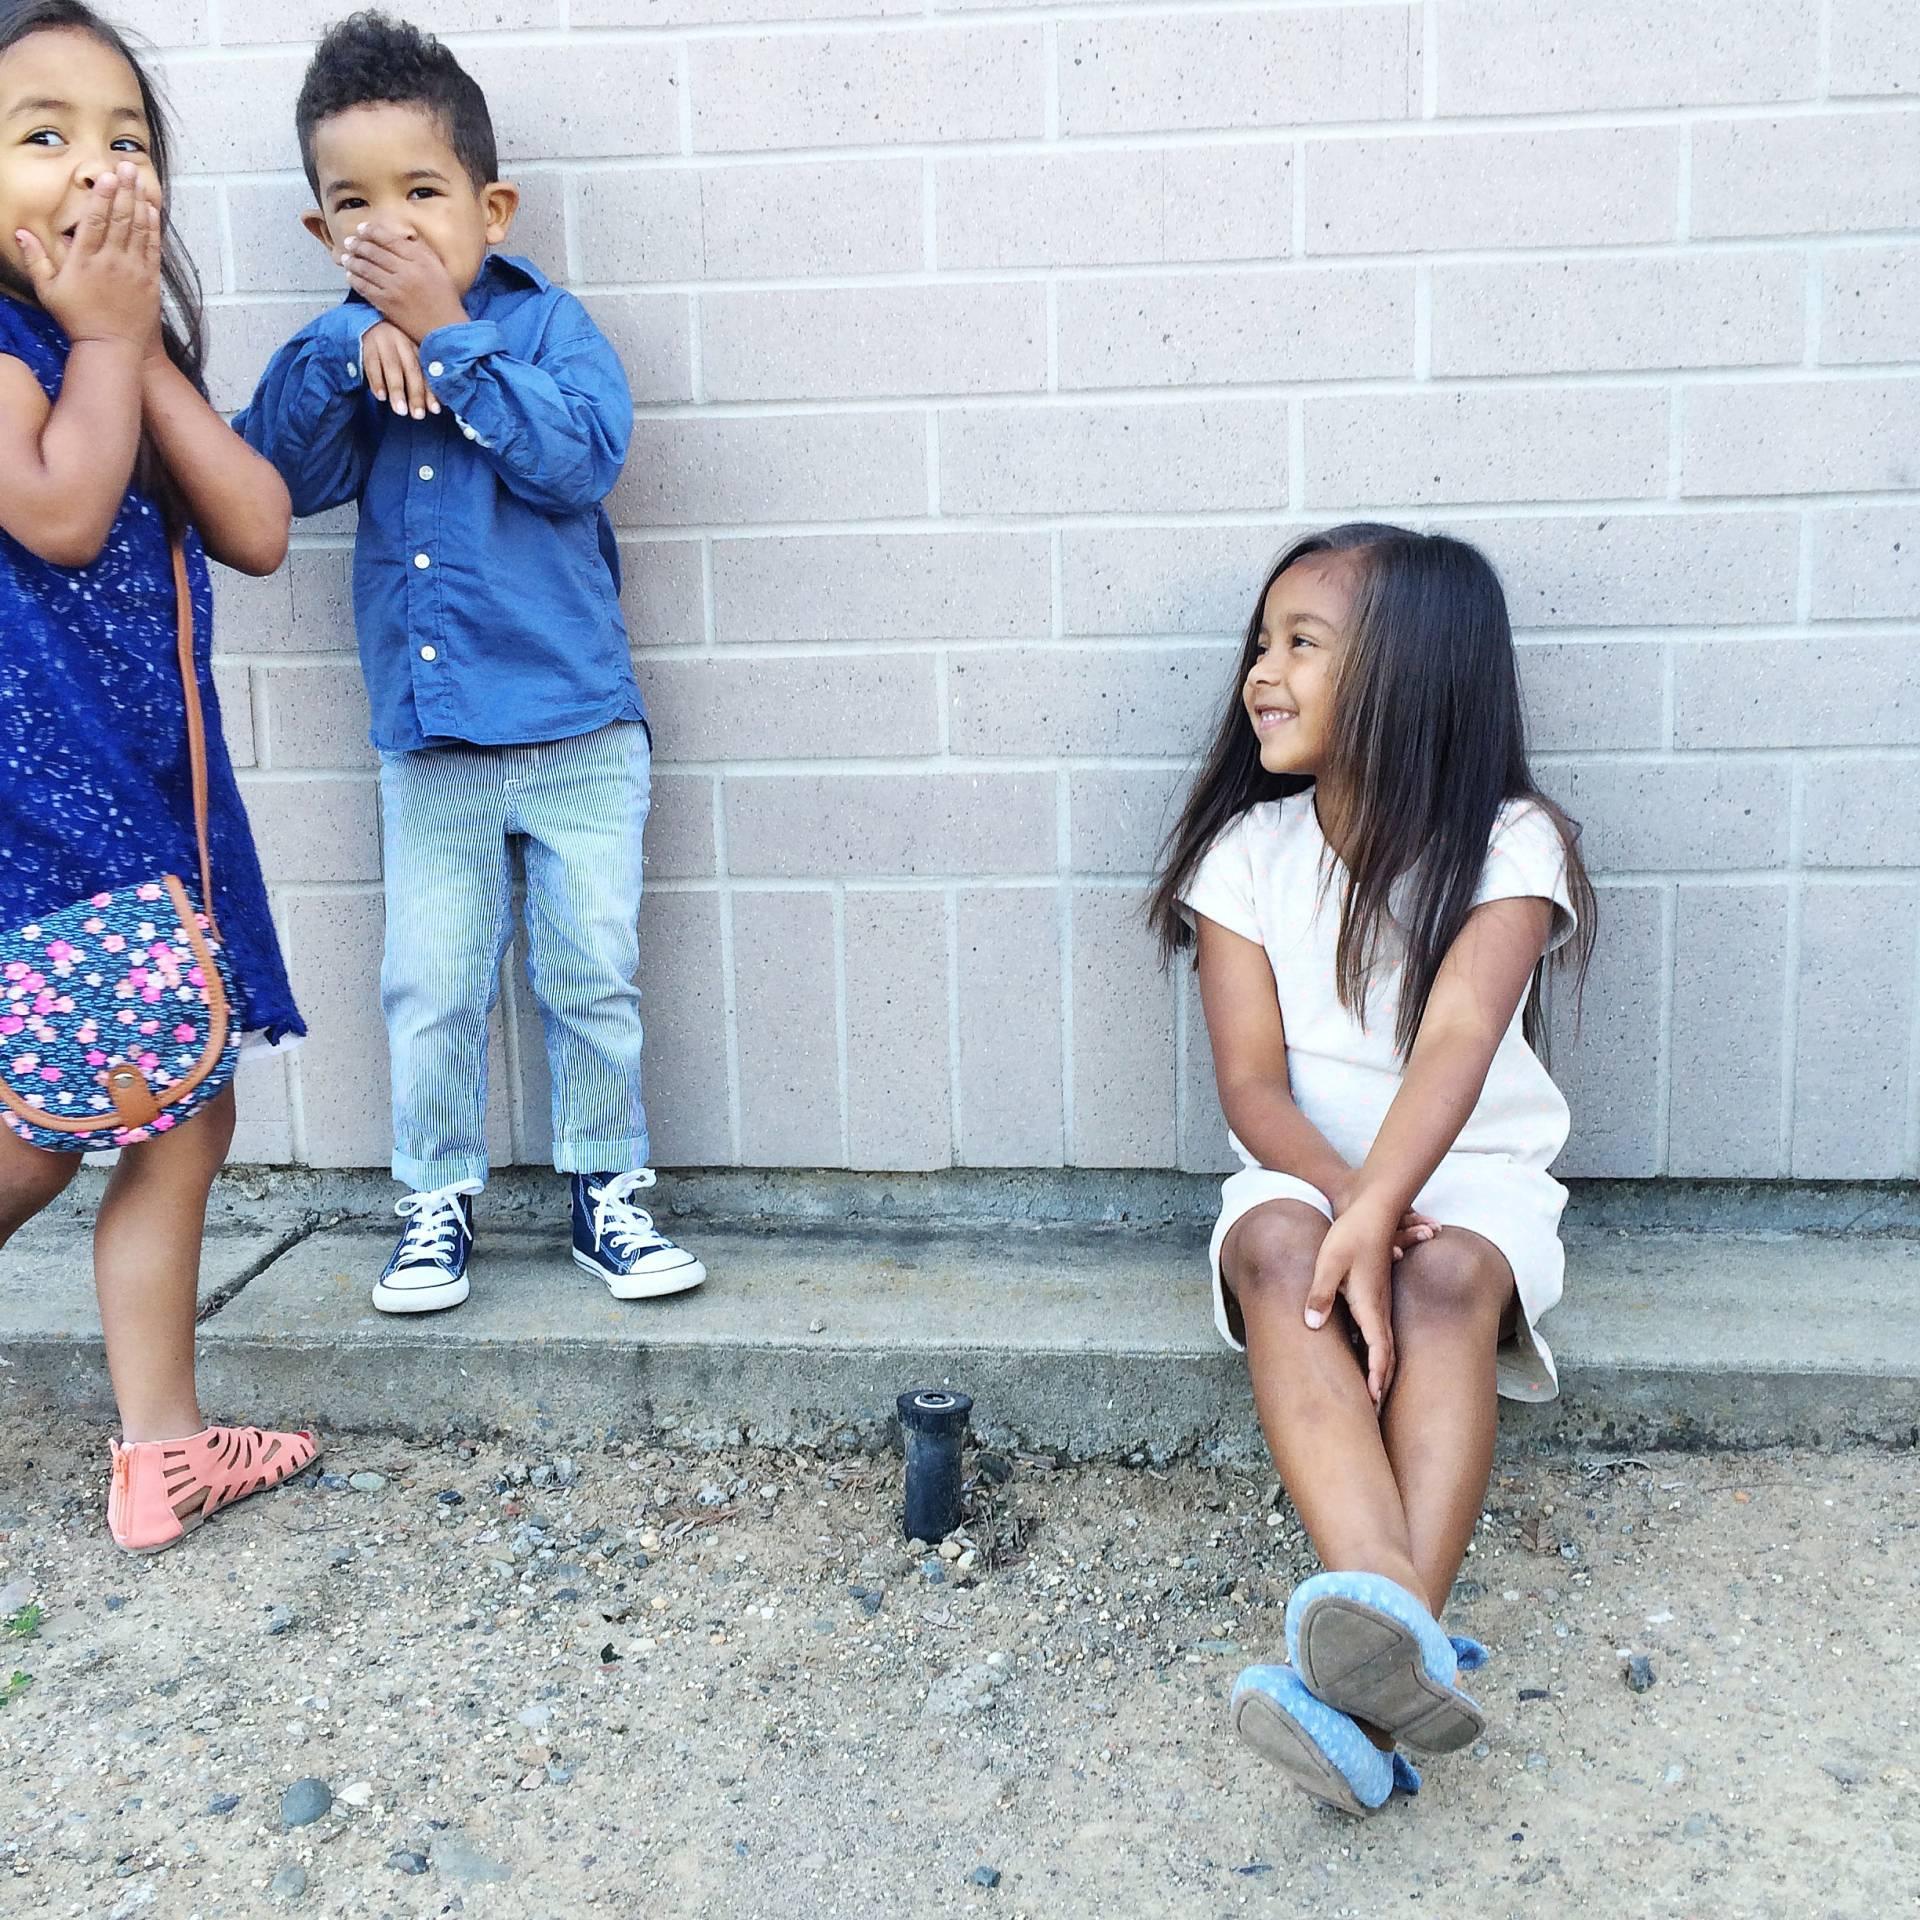 Easter Sunday Best: Three kids